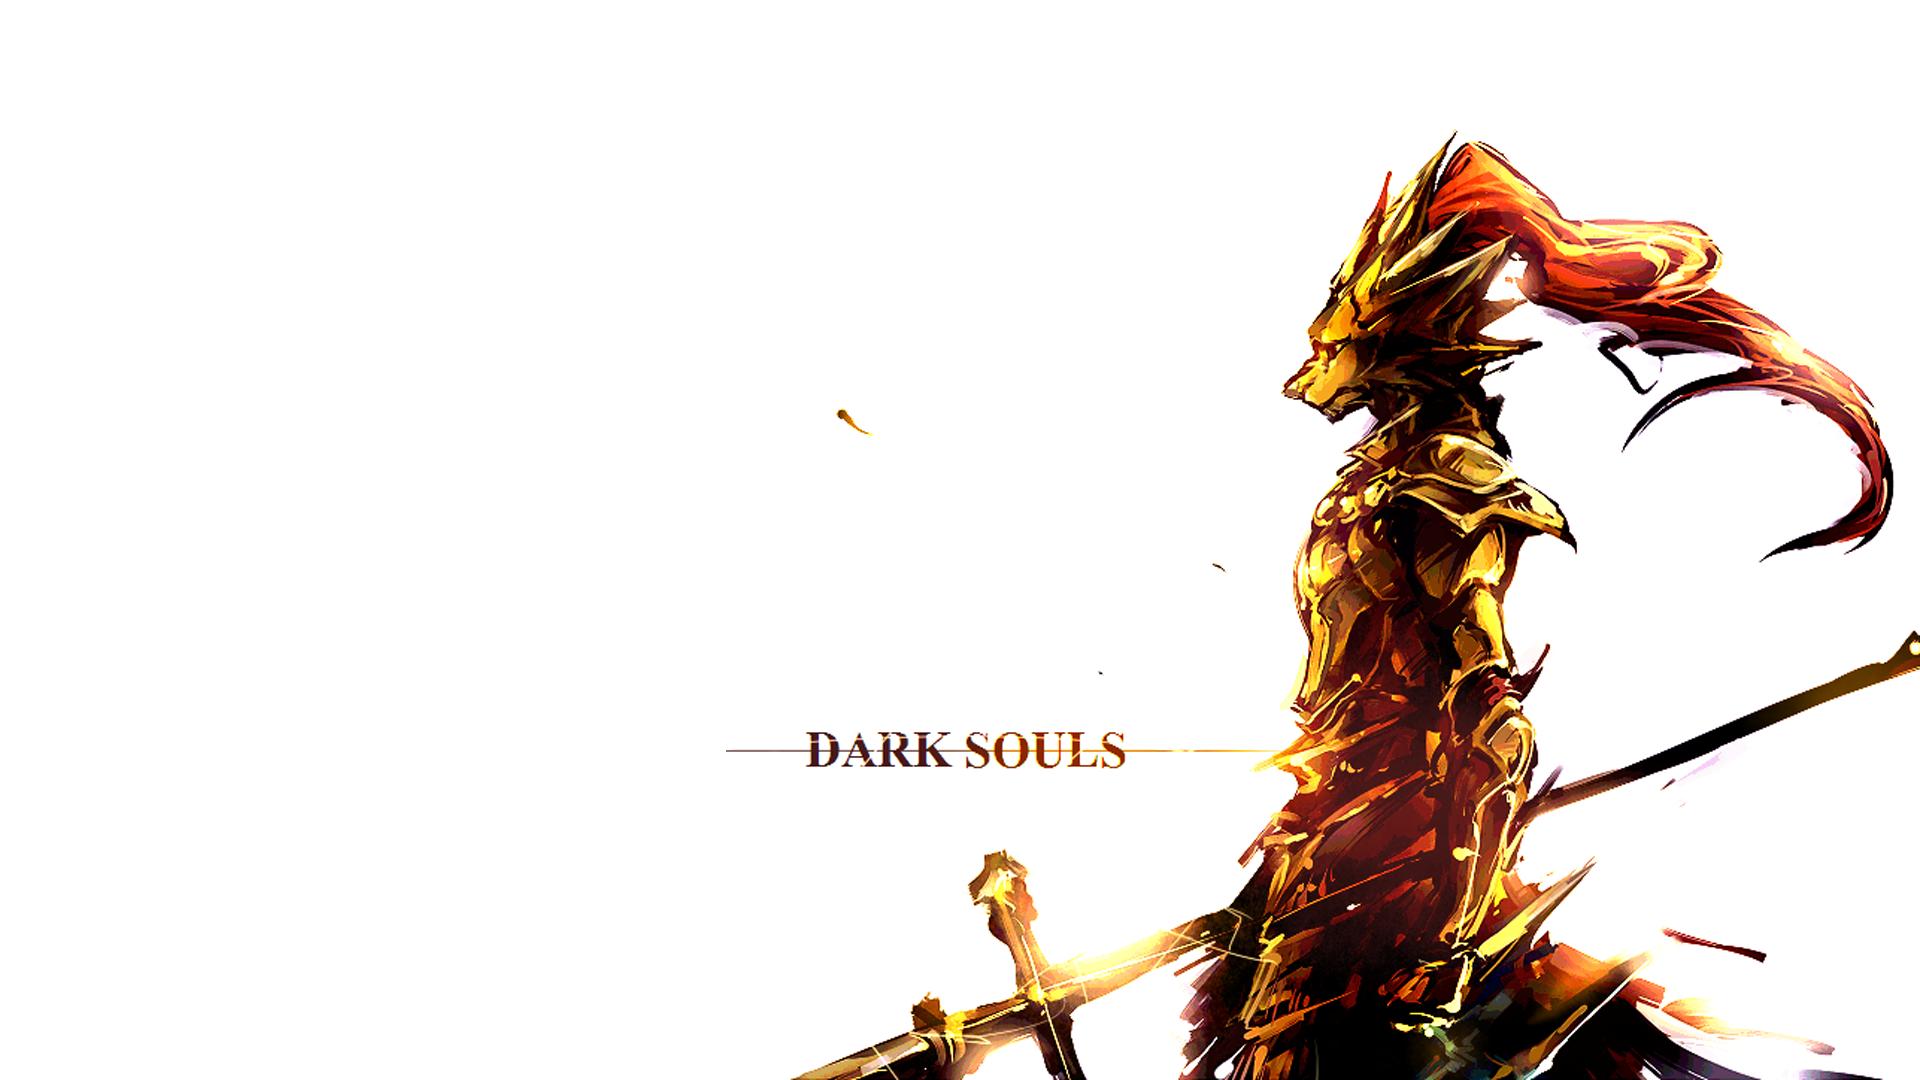 Dark Souls High Resolution Wallpapers (Xiao Exner